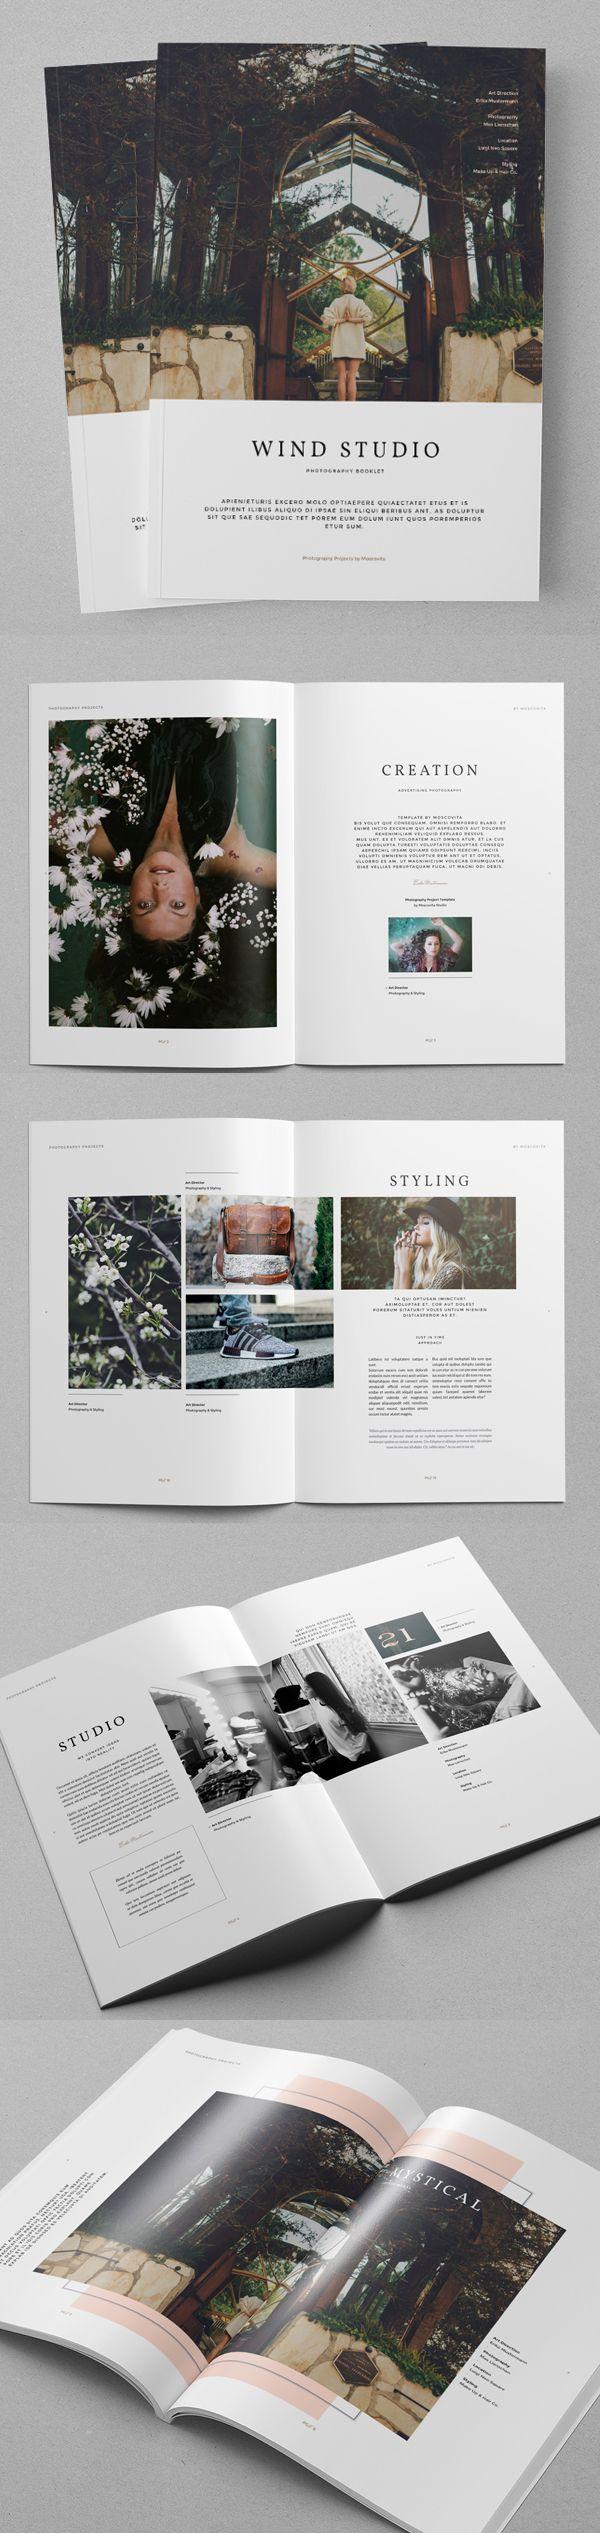 Photography Portfolio Brochure Templatebrochuretemplates fashioncatalog catalogdesign